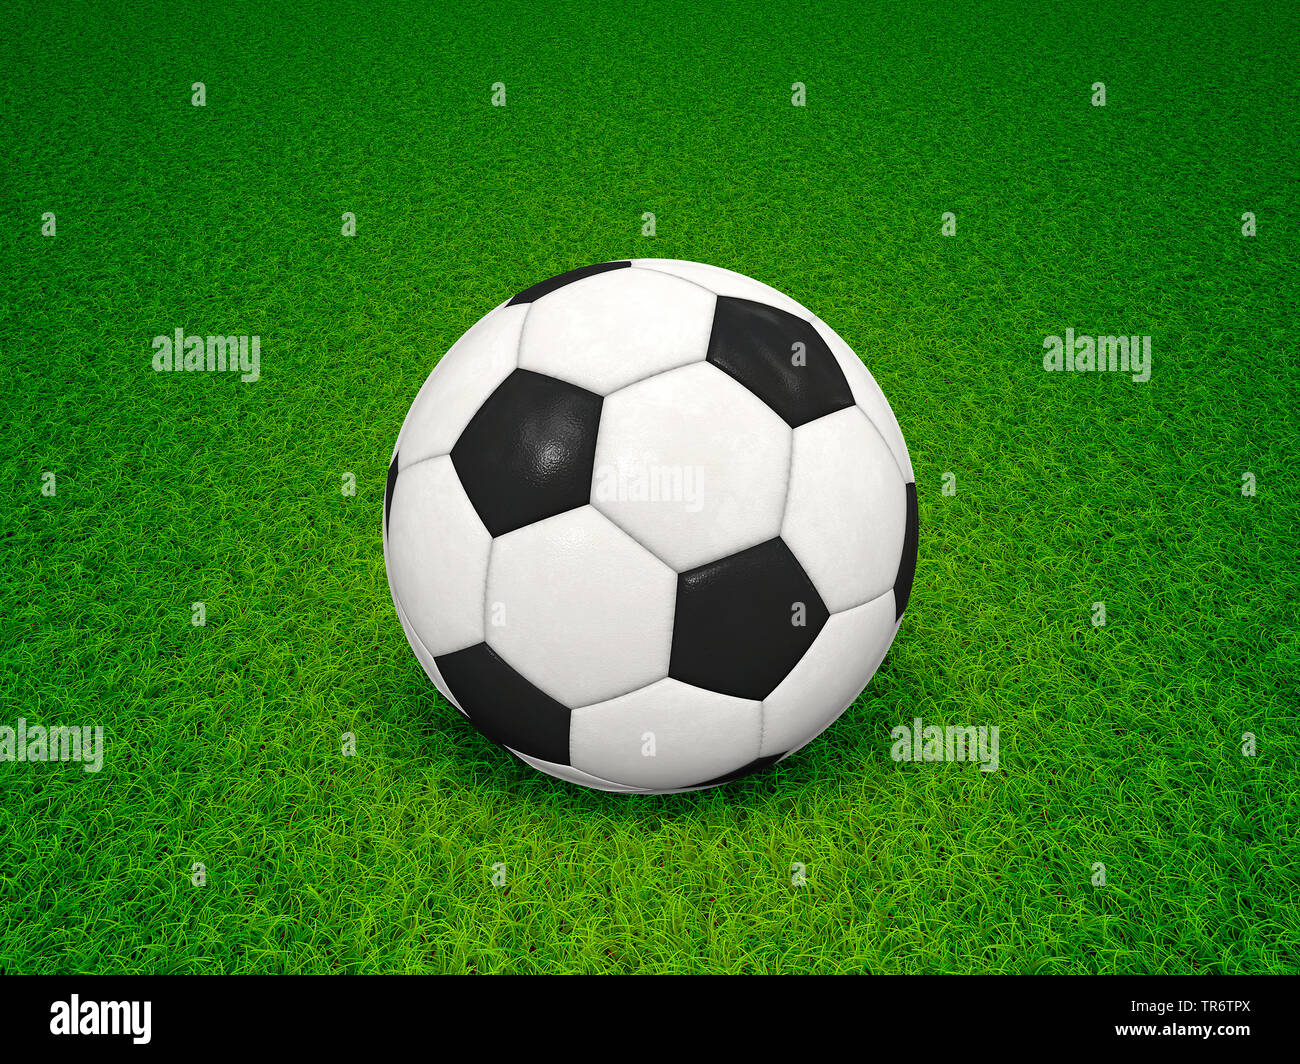 Fussball auf gruenem Rasen, Computergrafik | football on green lawn, computer graphic | BLWS490629.jpg [ (c) blickwinkel/McPHOTO/M. Gann Tel. +49 (0)2 - Stock Image